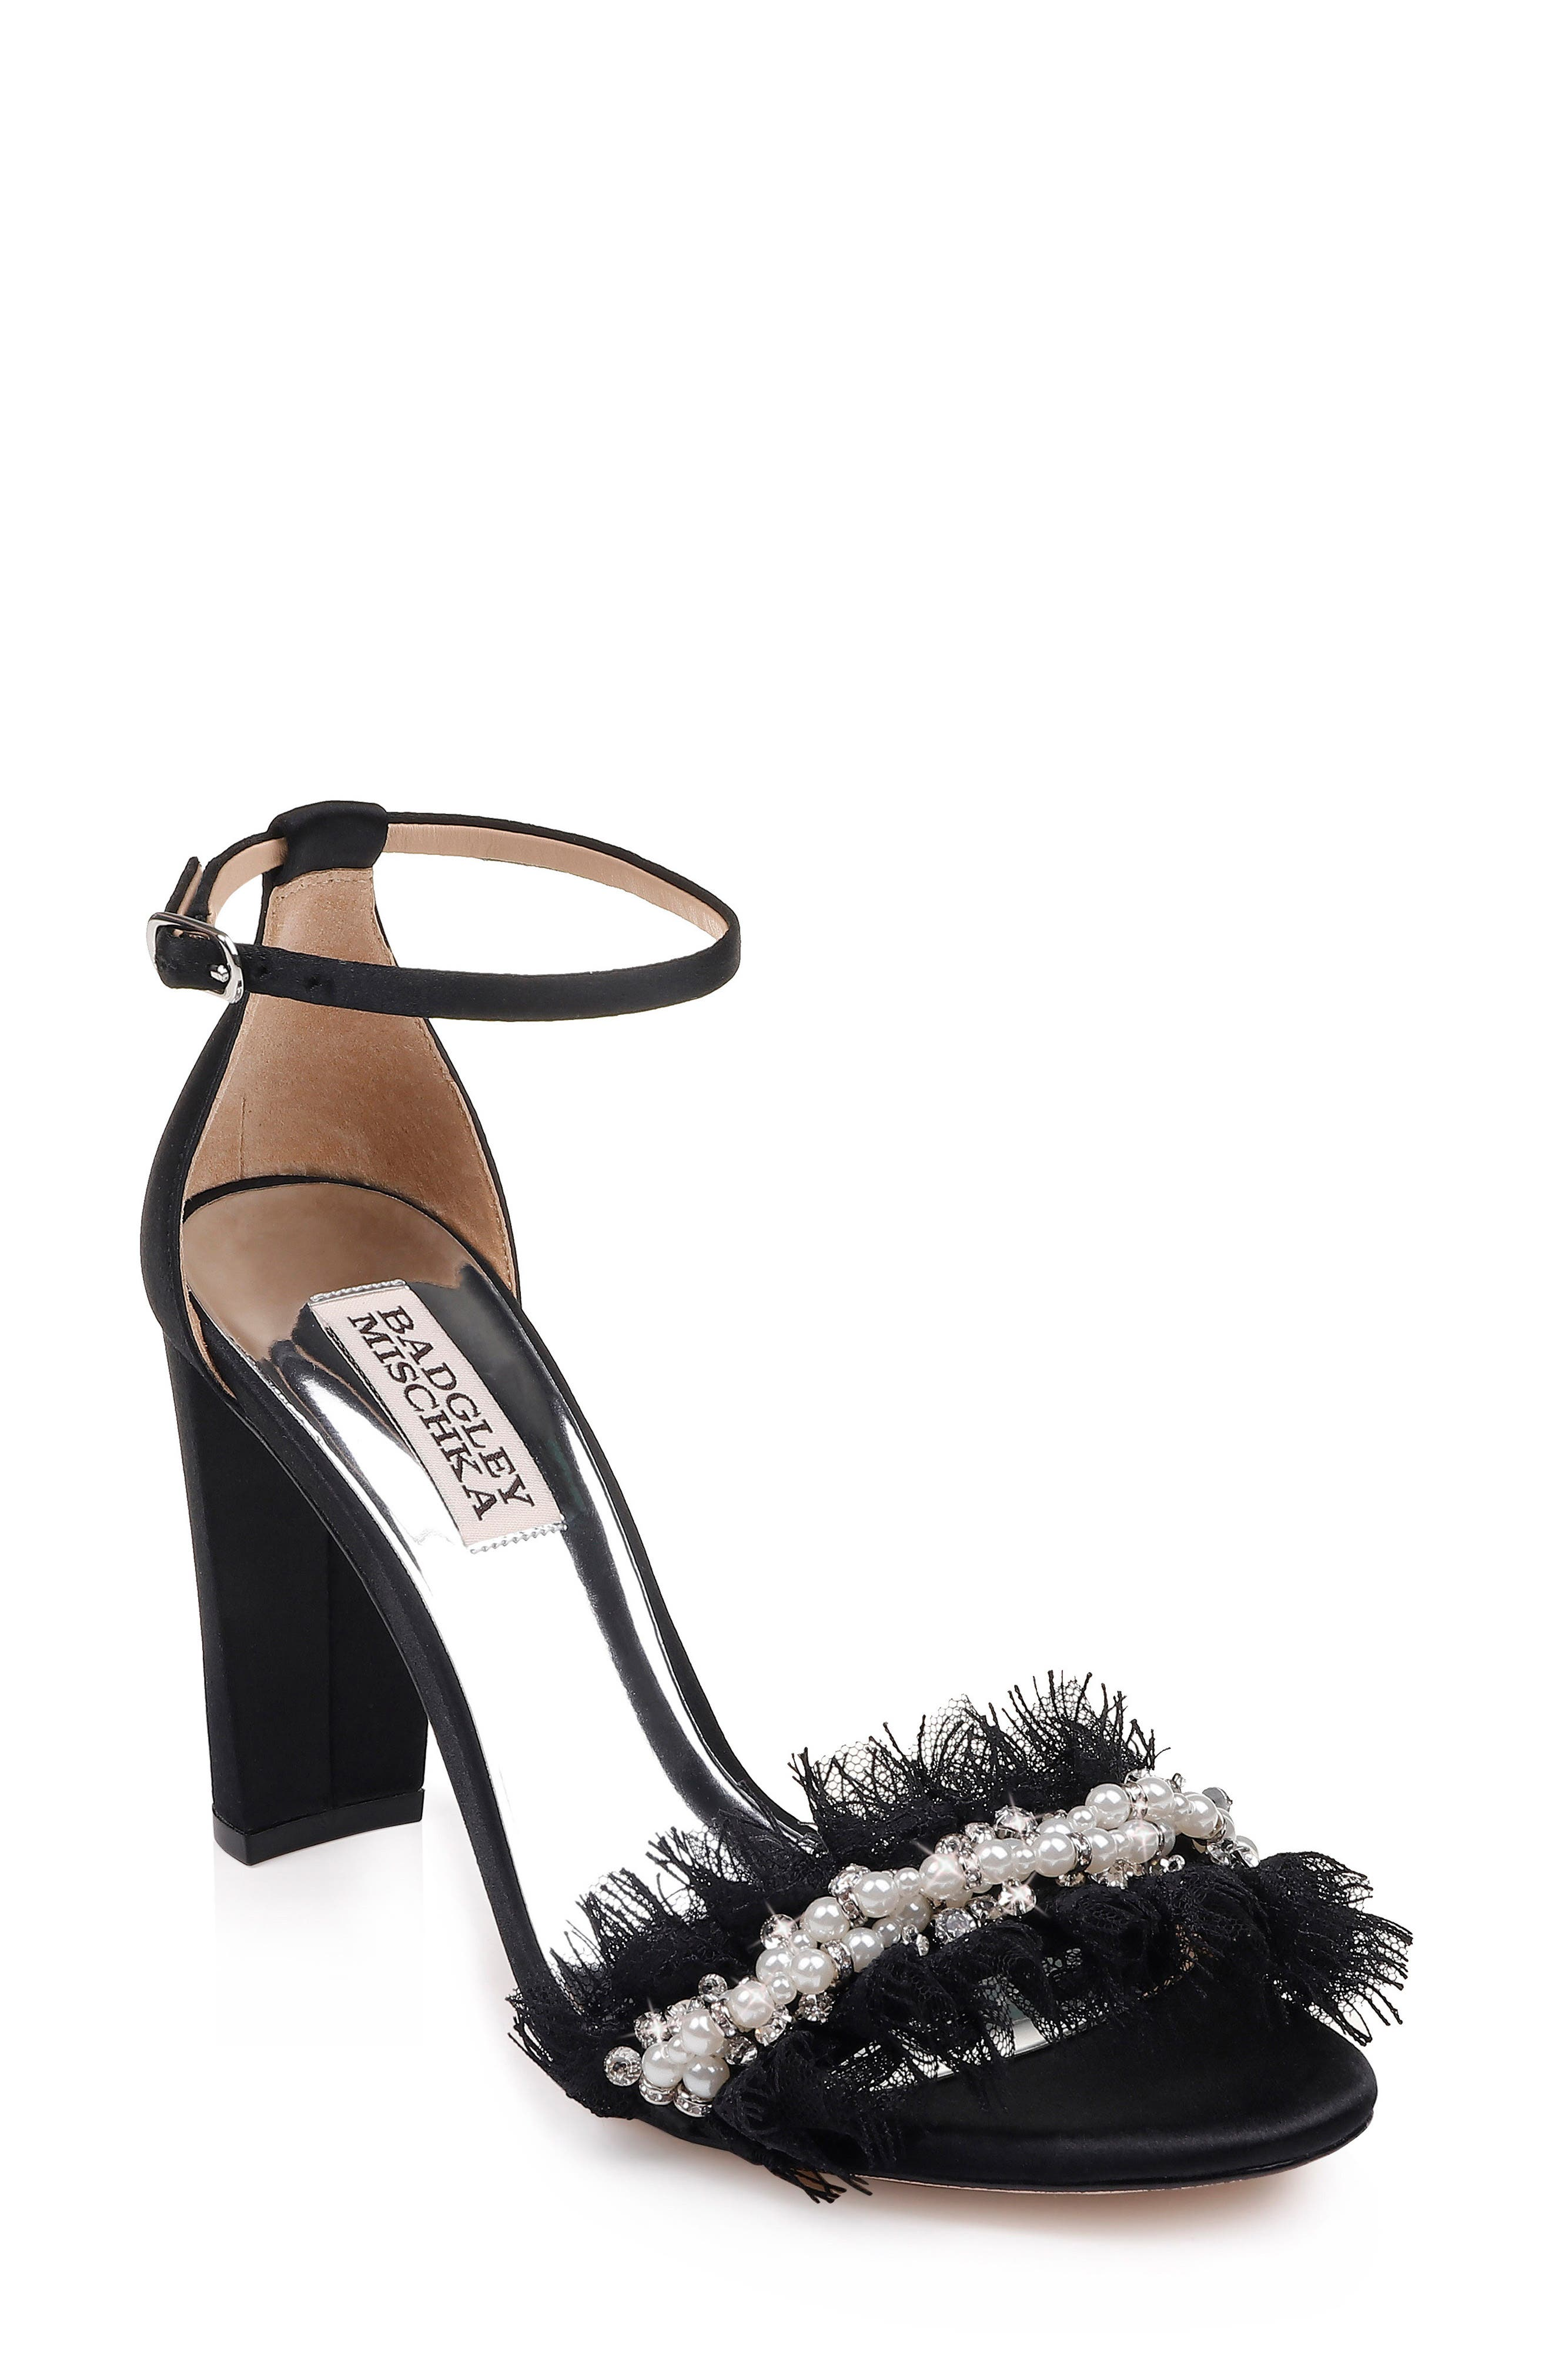 Badgley Mischka Fleur Ankle Strap Sandal, Main, color, BLACK SATIN/ CHIFFON